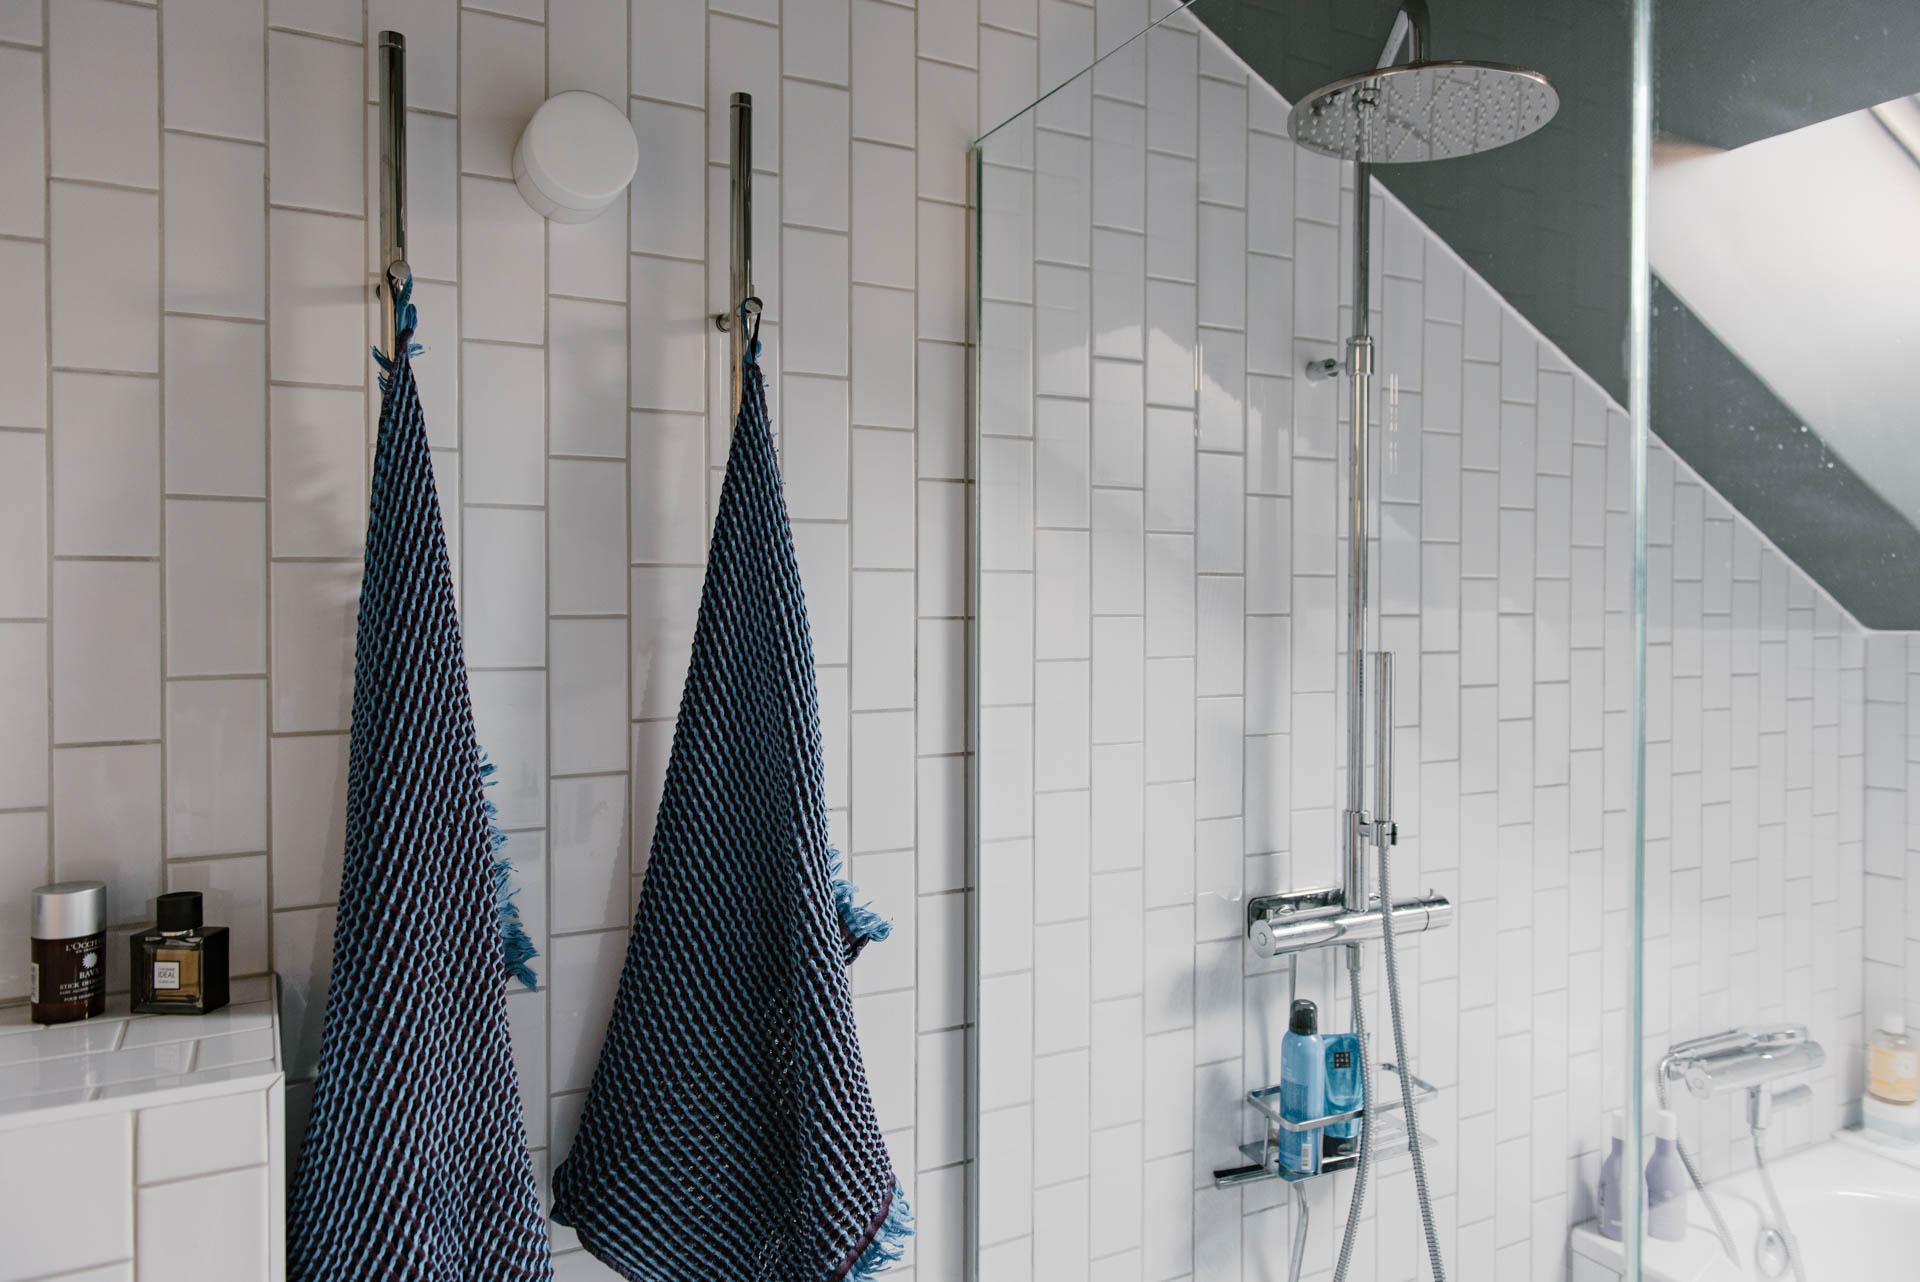 Verrassend leuke, ruime en lichte badkamer